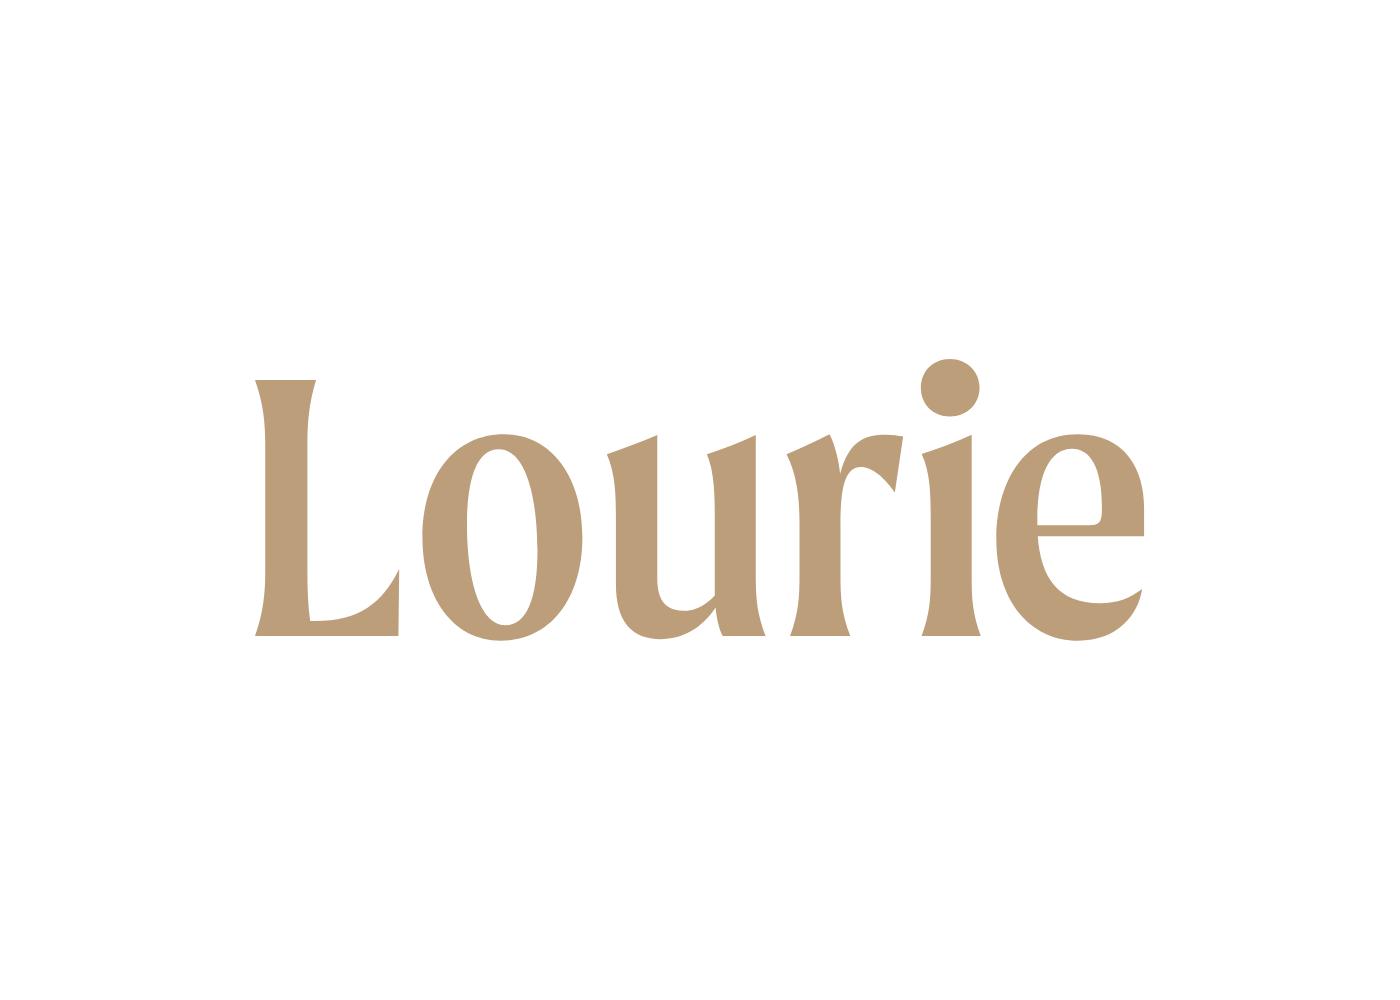 Logodesign Lourie